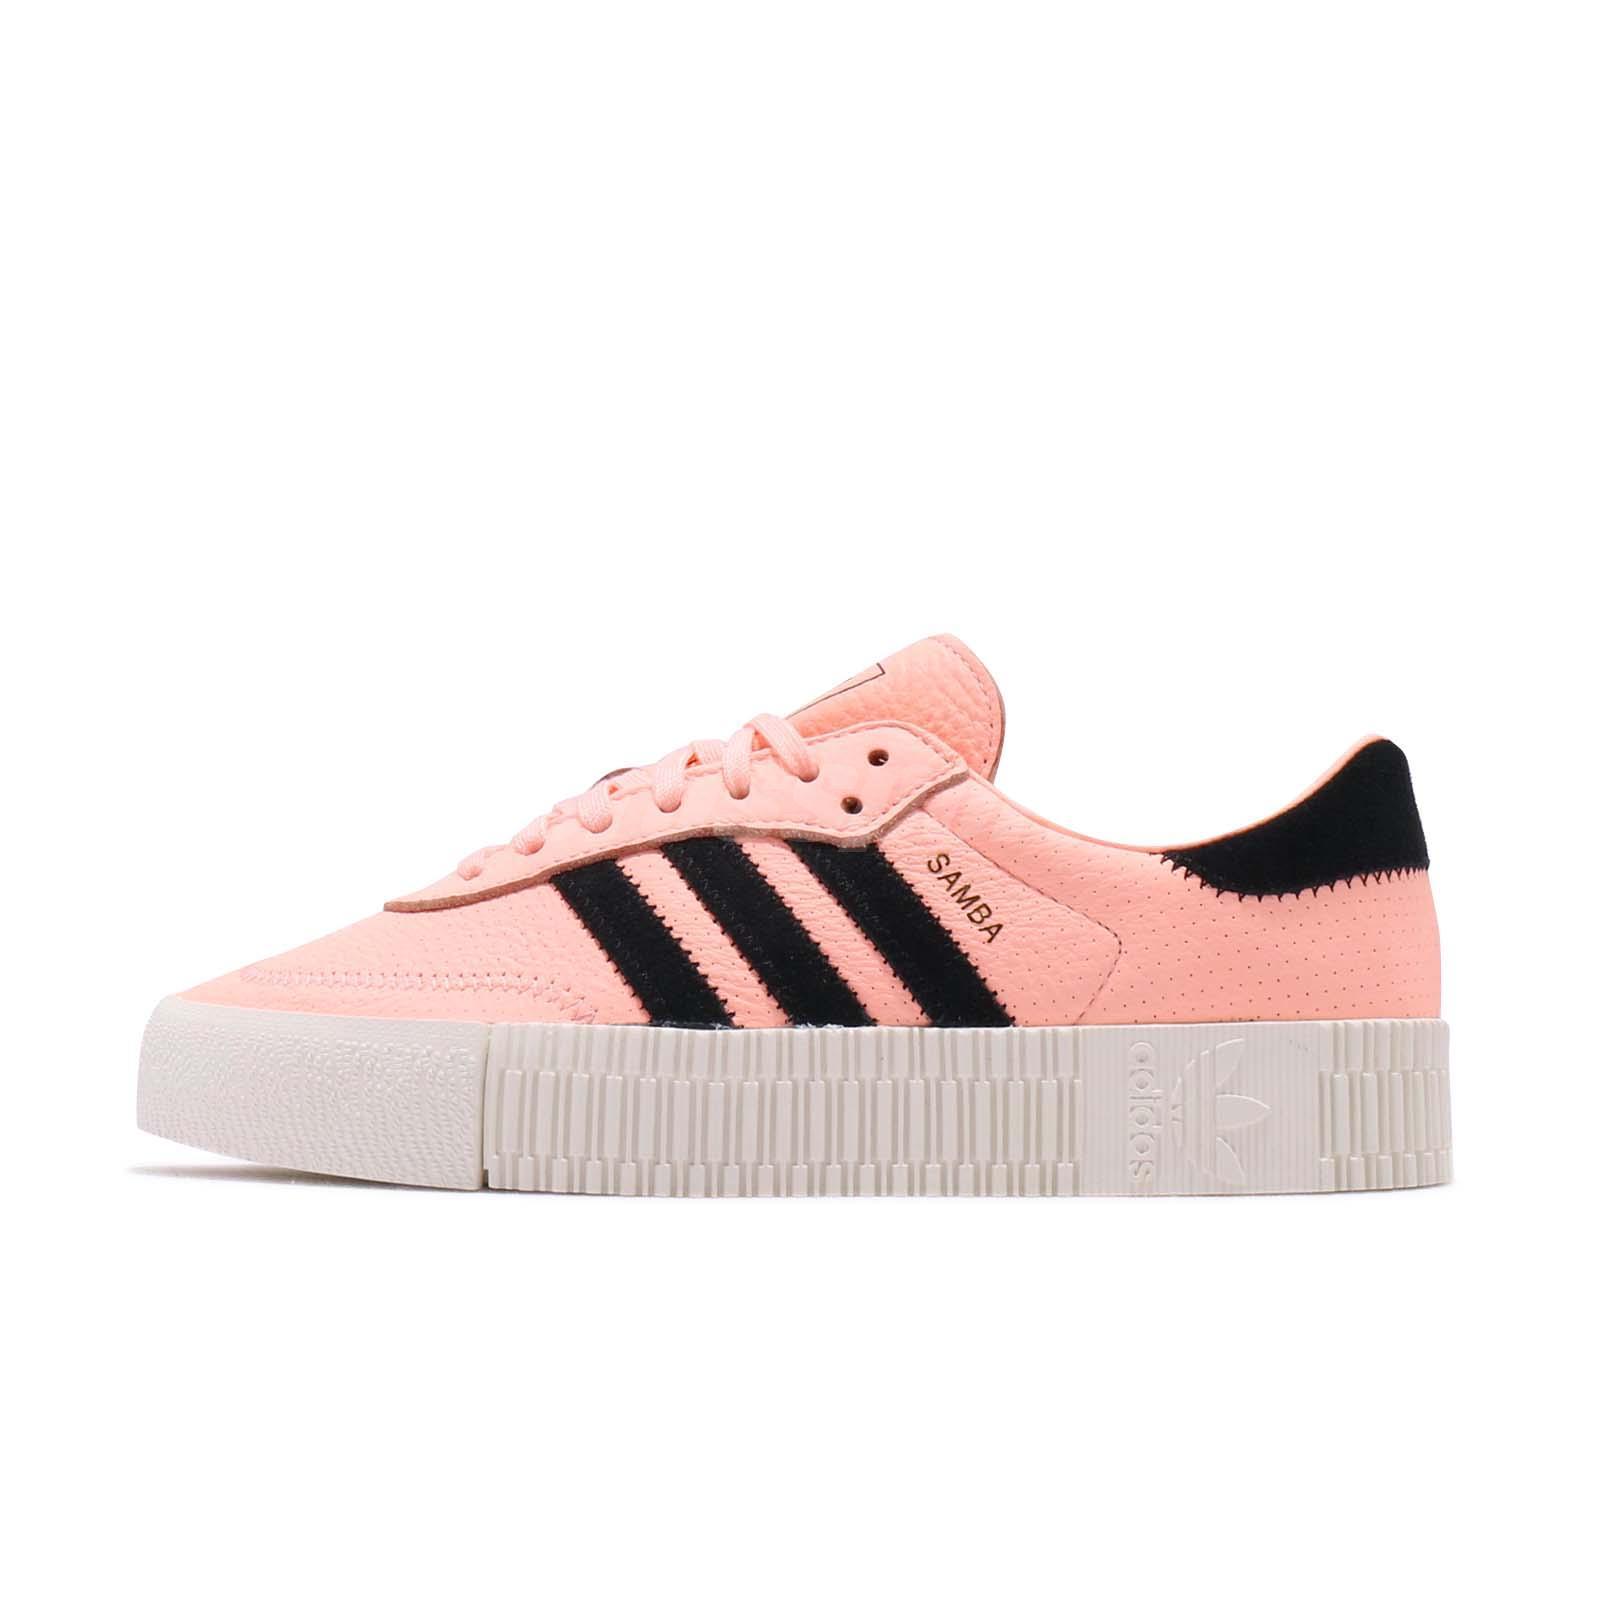 5b026f03cff adidas Originals Sambarose W Orange Black Off White Women Platform Shoes  F34240